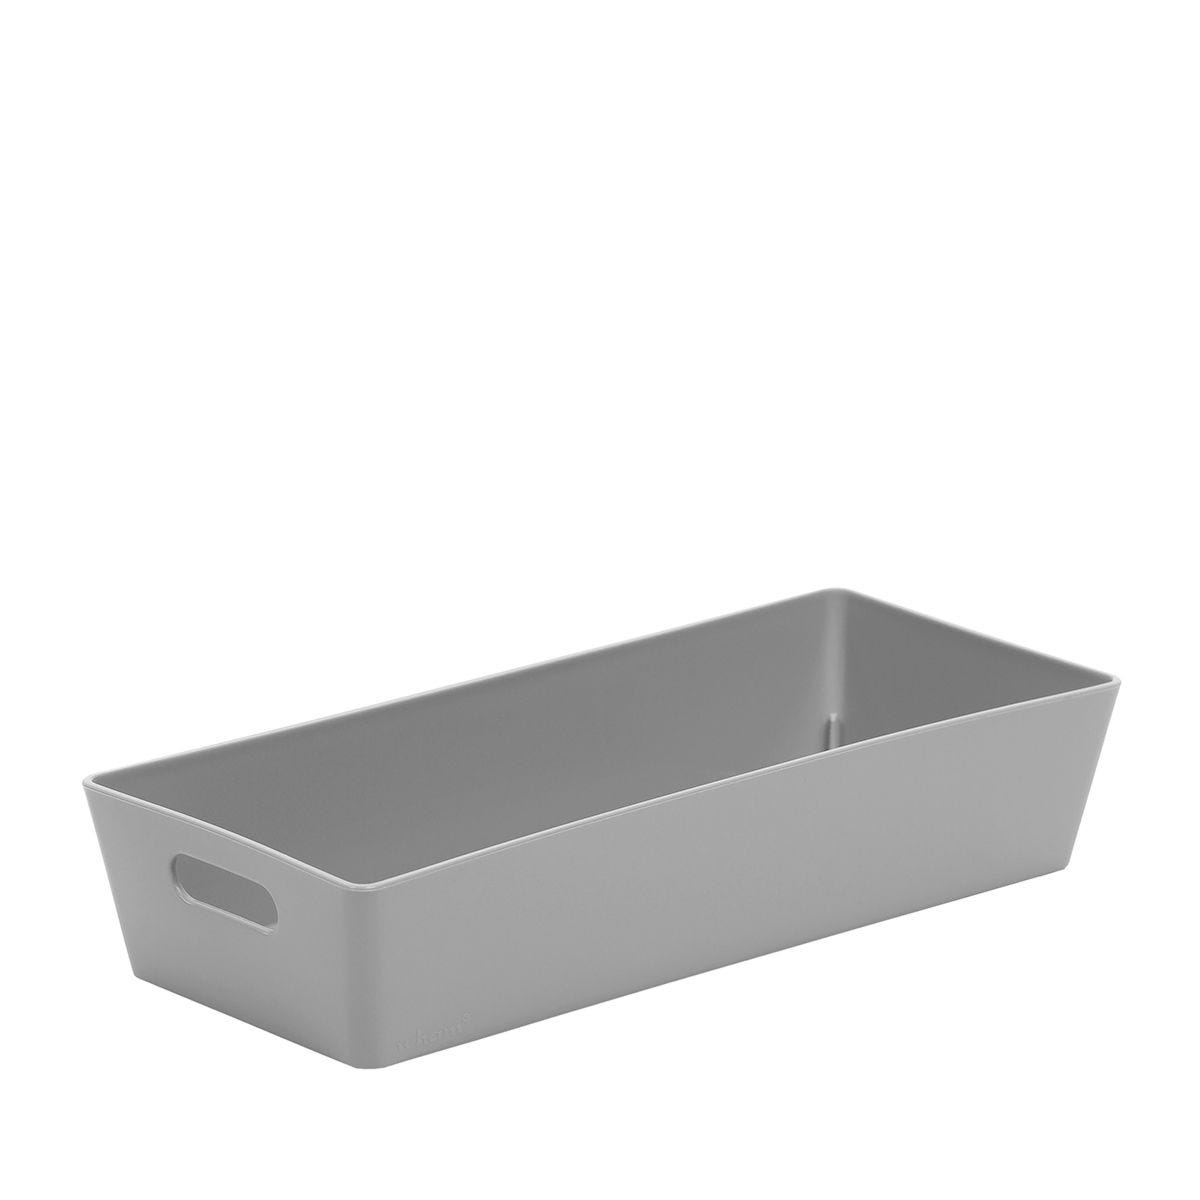 Wham Rectangular Studio Store Basket 2.01 - Cool Grey